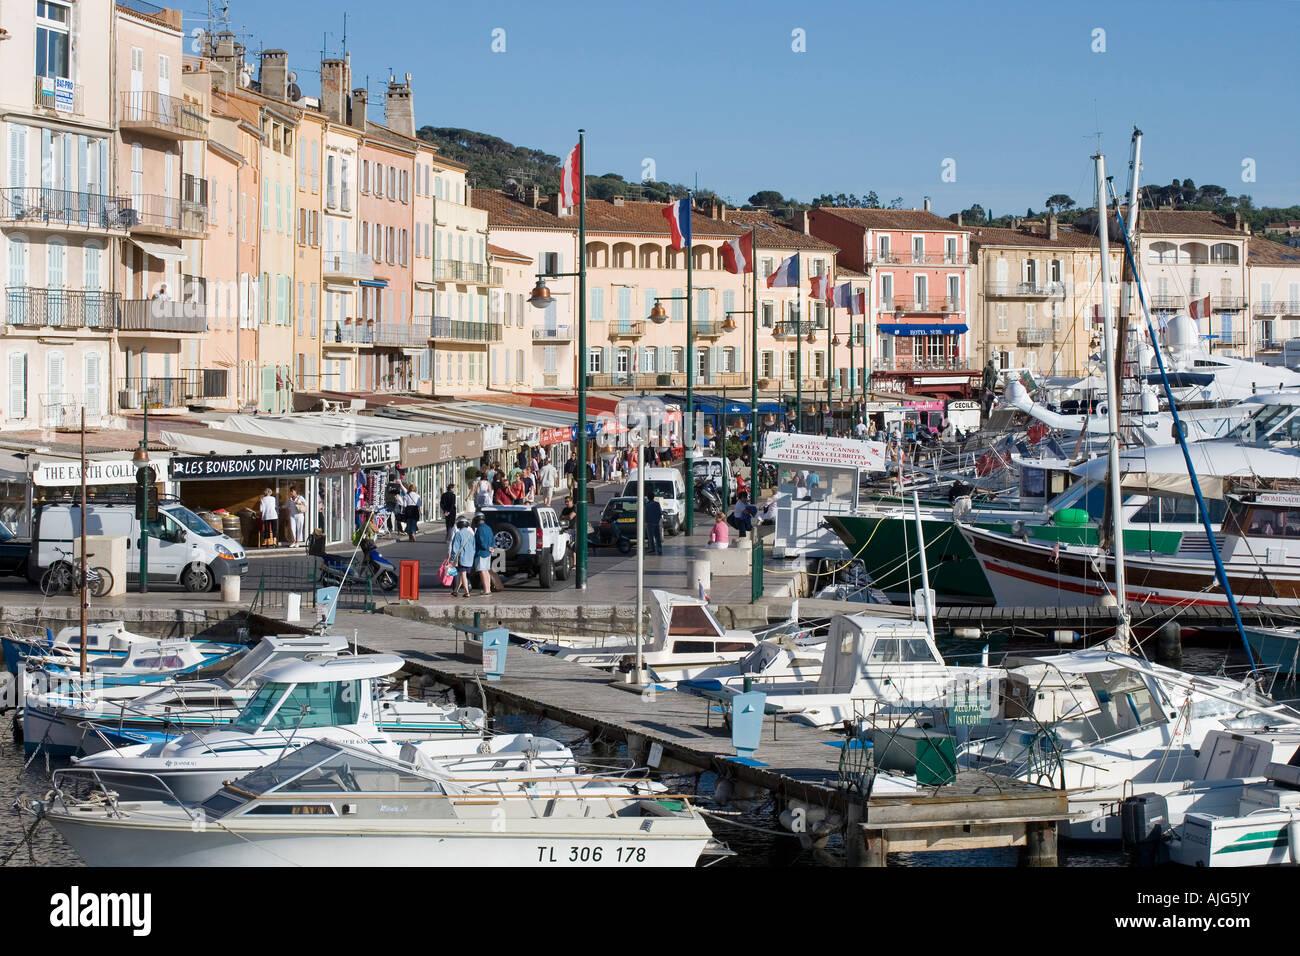 Saint Tropez Port Basin And Promenade Stock Photo 14728562 Alamy